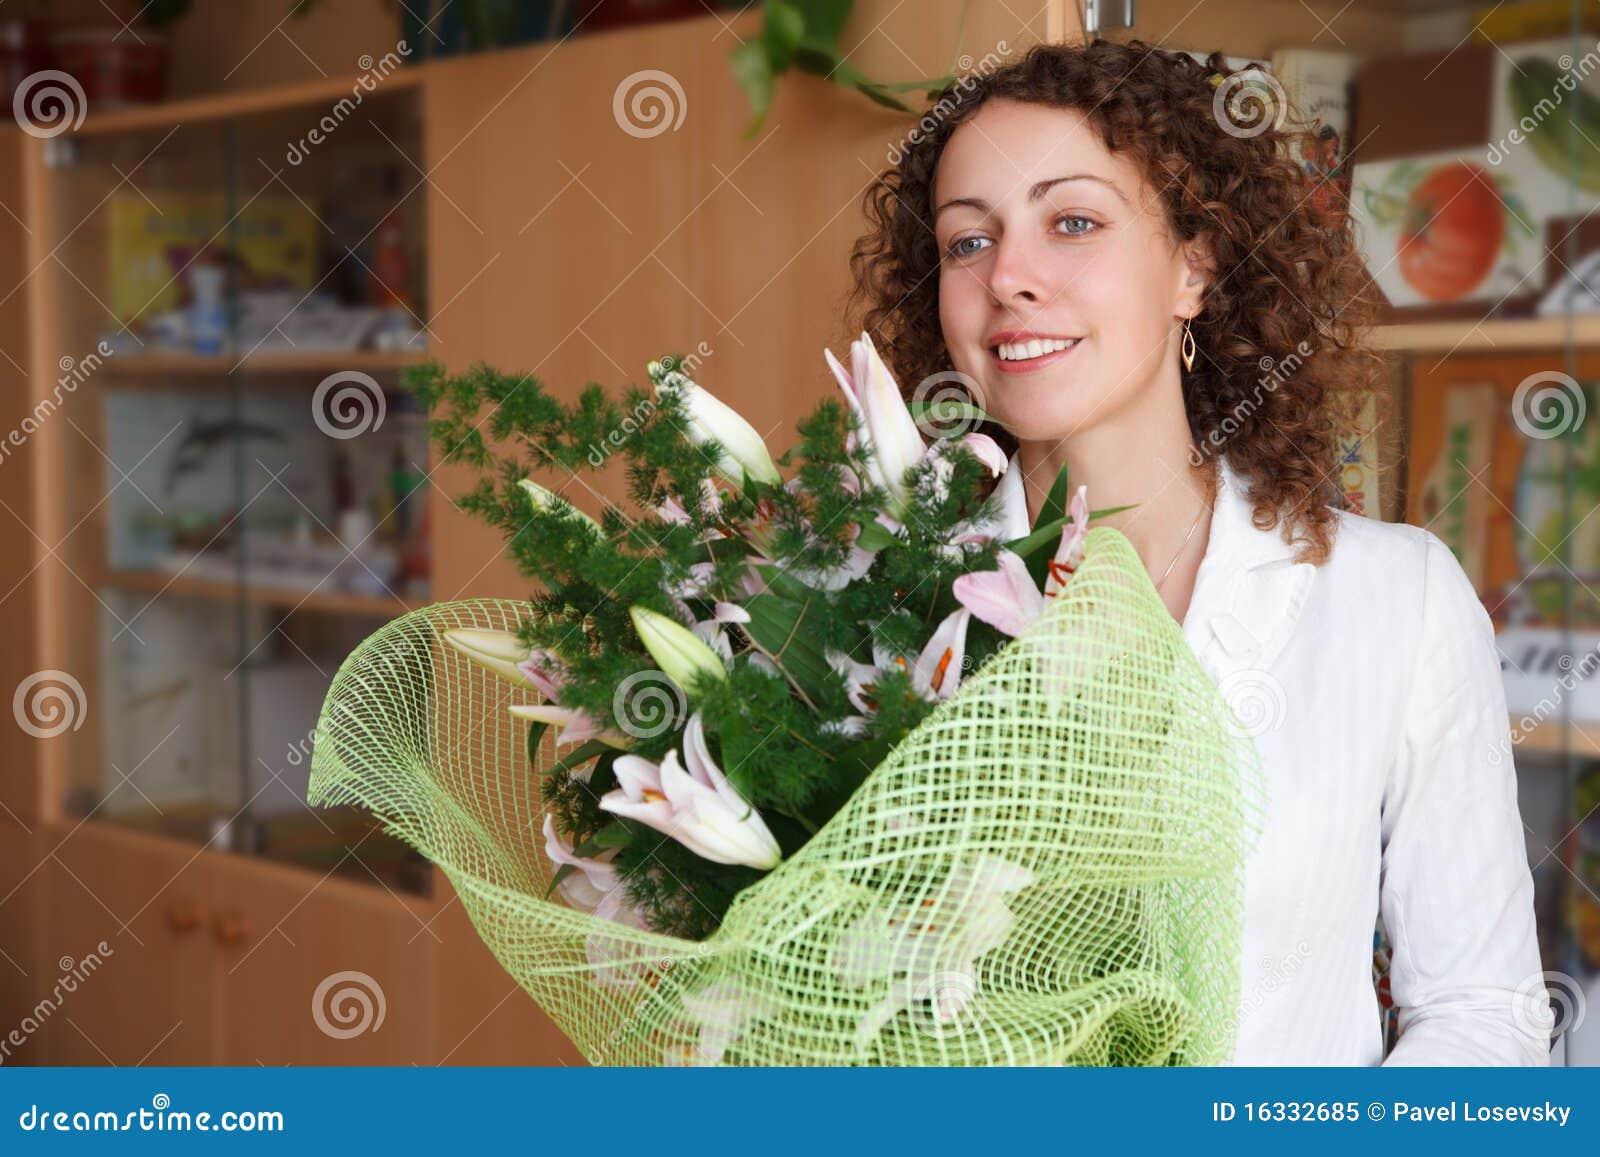 Фото дарят цветы учителю